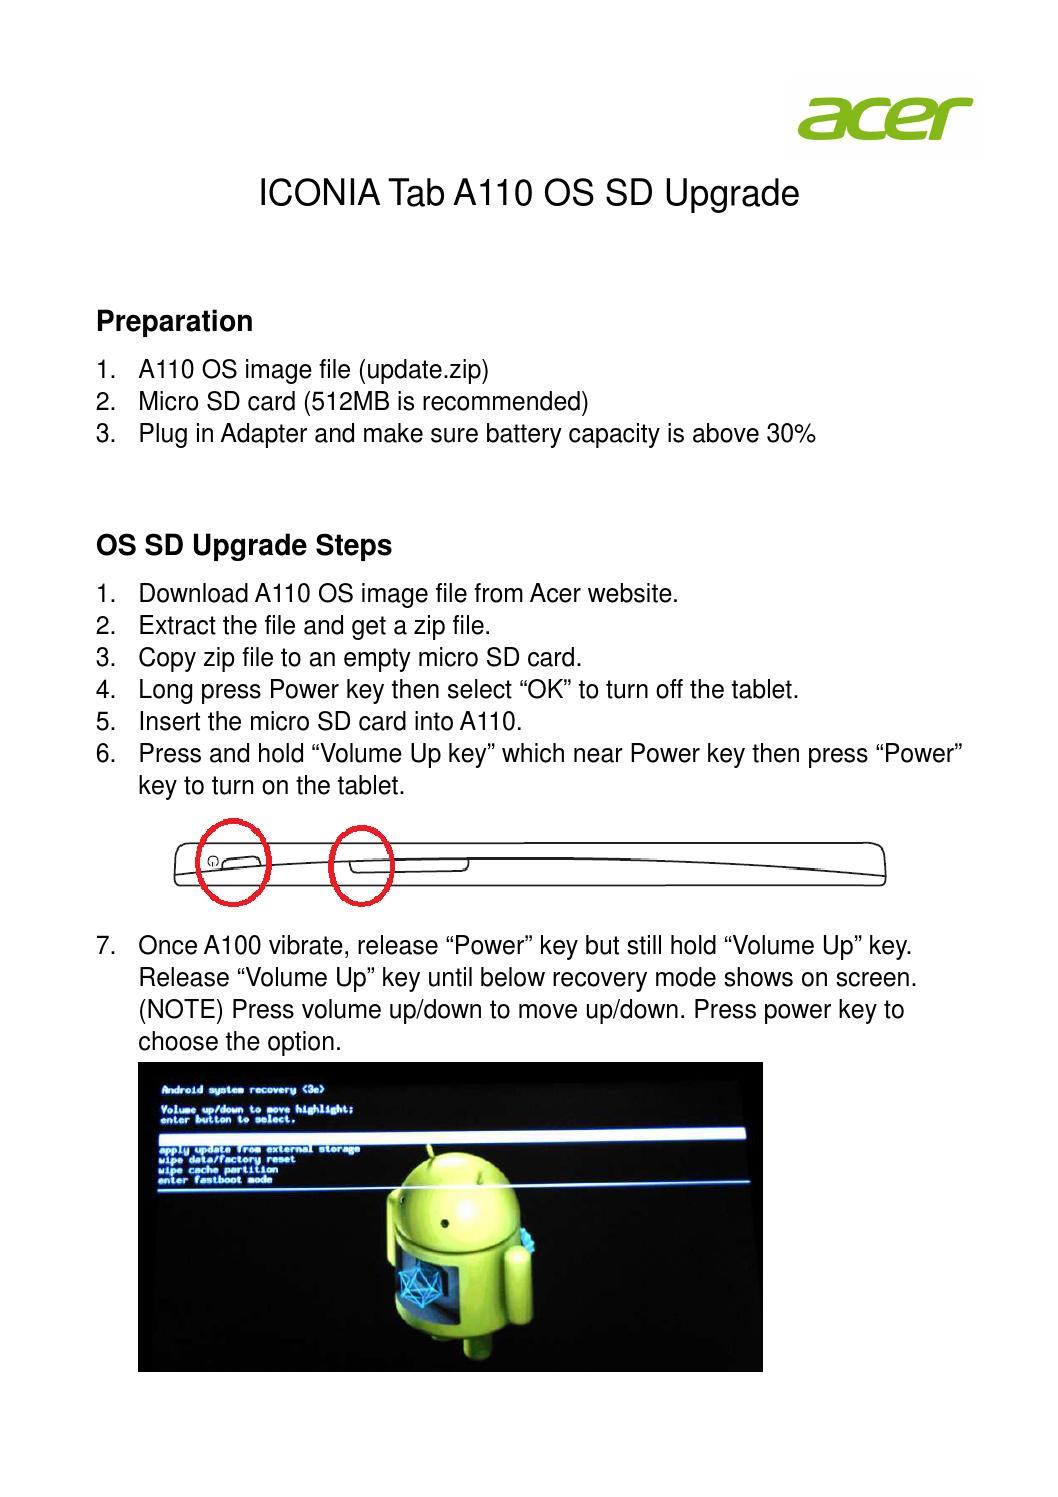 Android Power Key Press